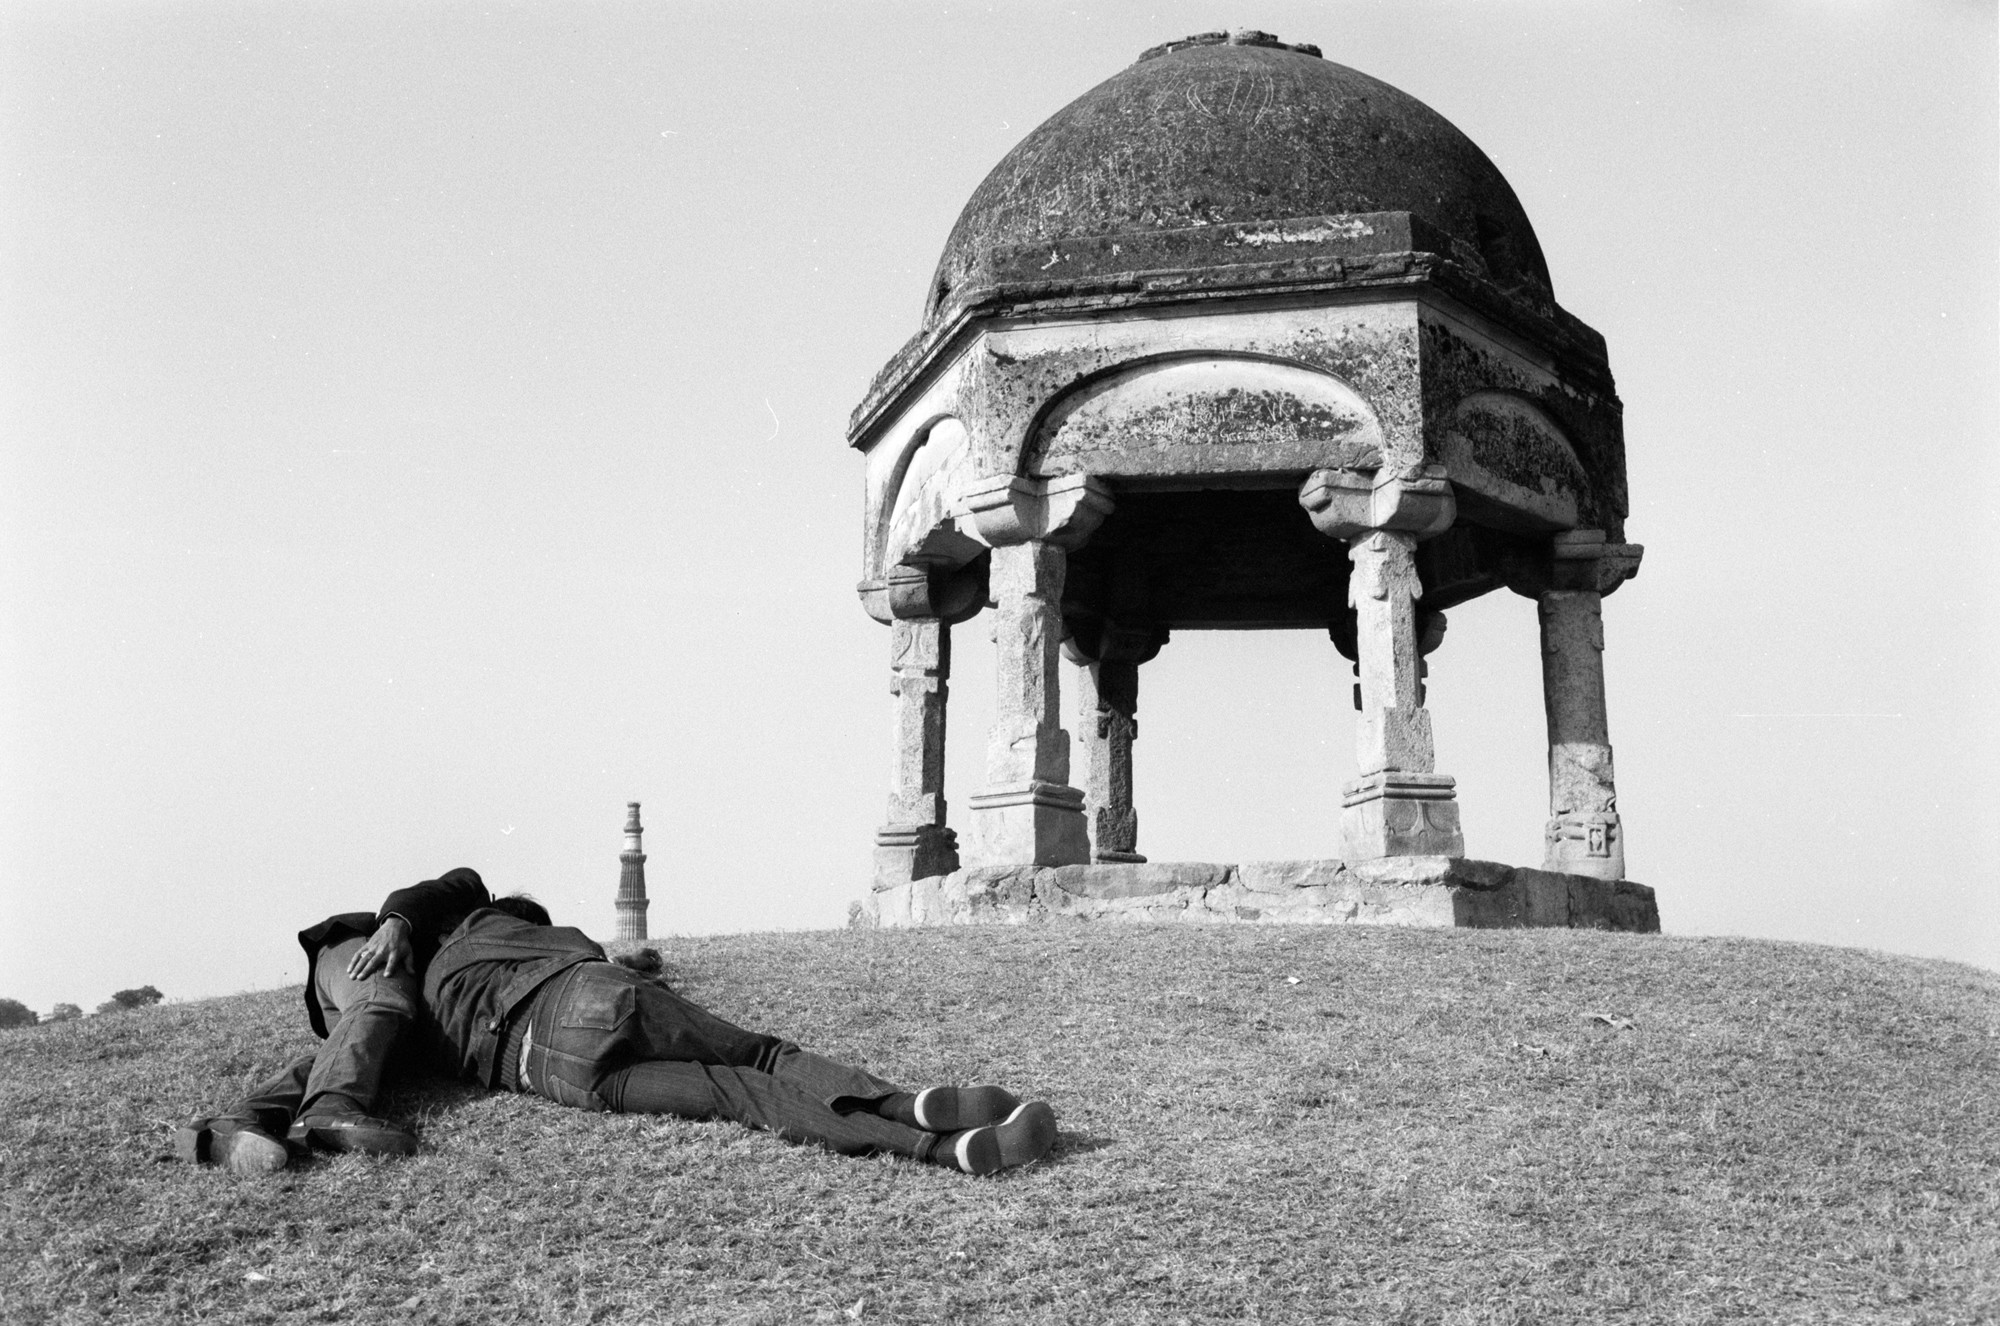 Untitled, Qutub Minar, 1983